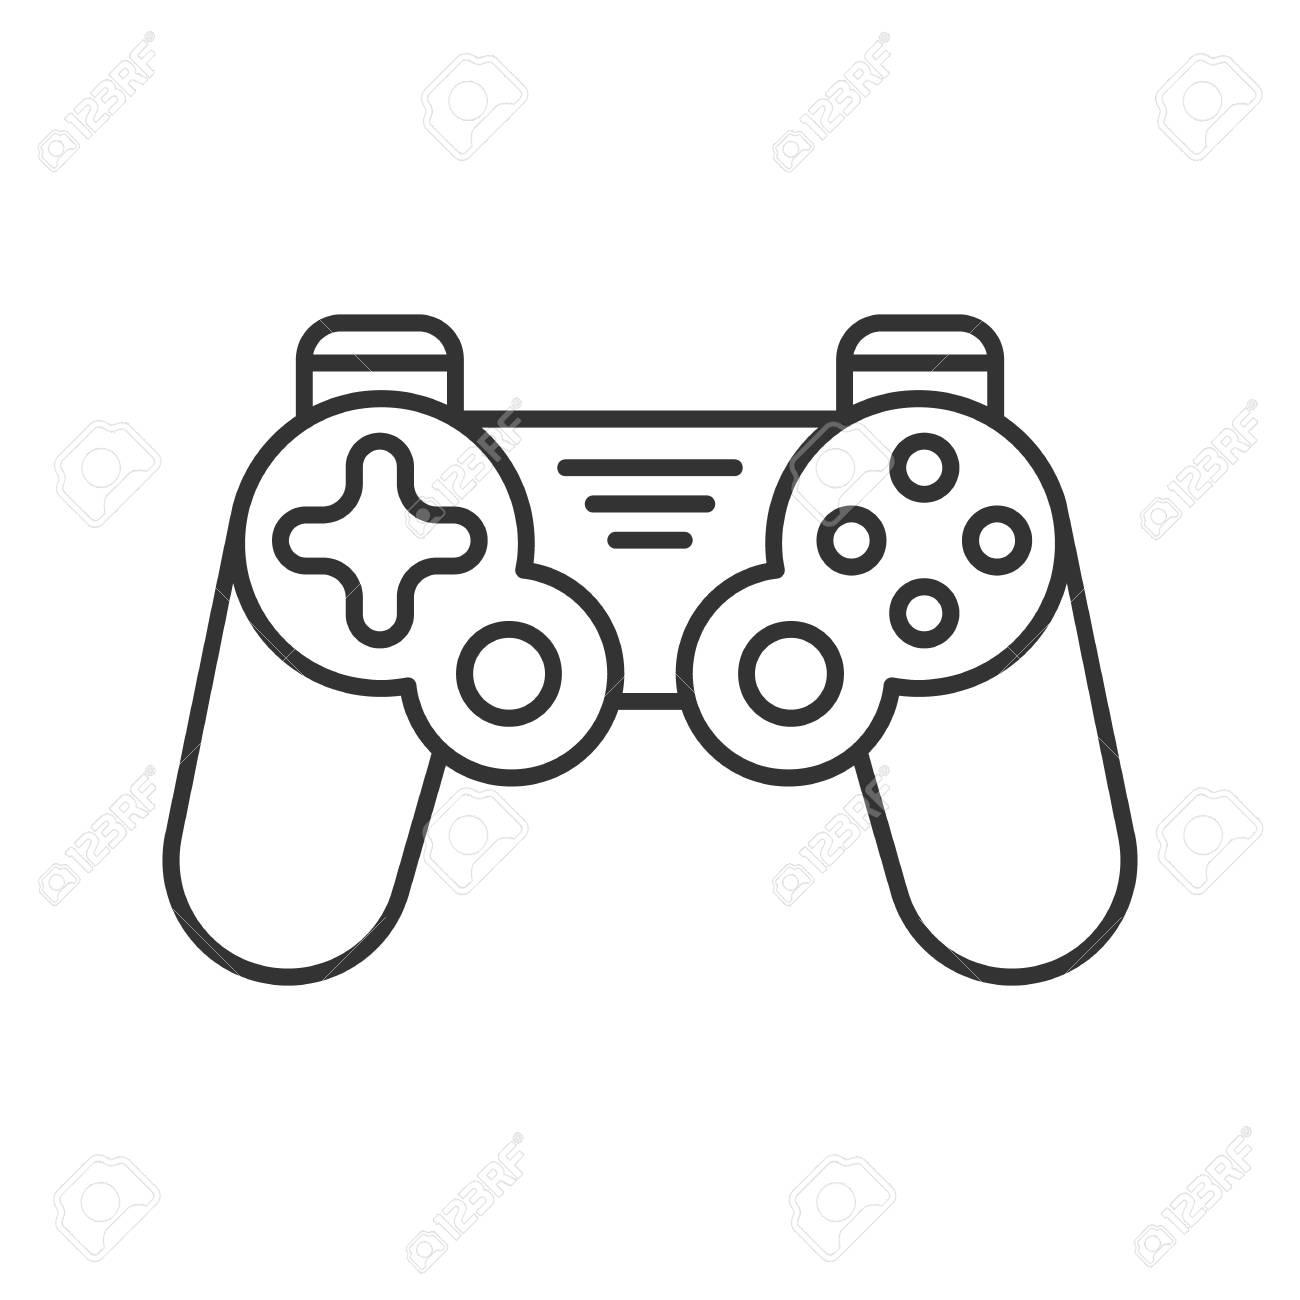 Gamepad Linear Icon Thin Line Illustration Joystick Contour